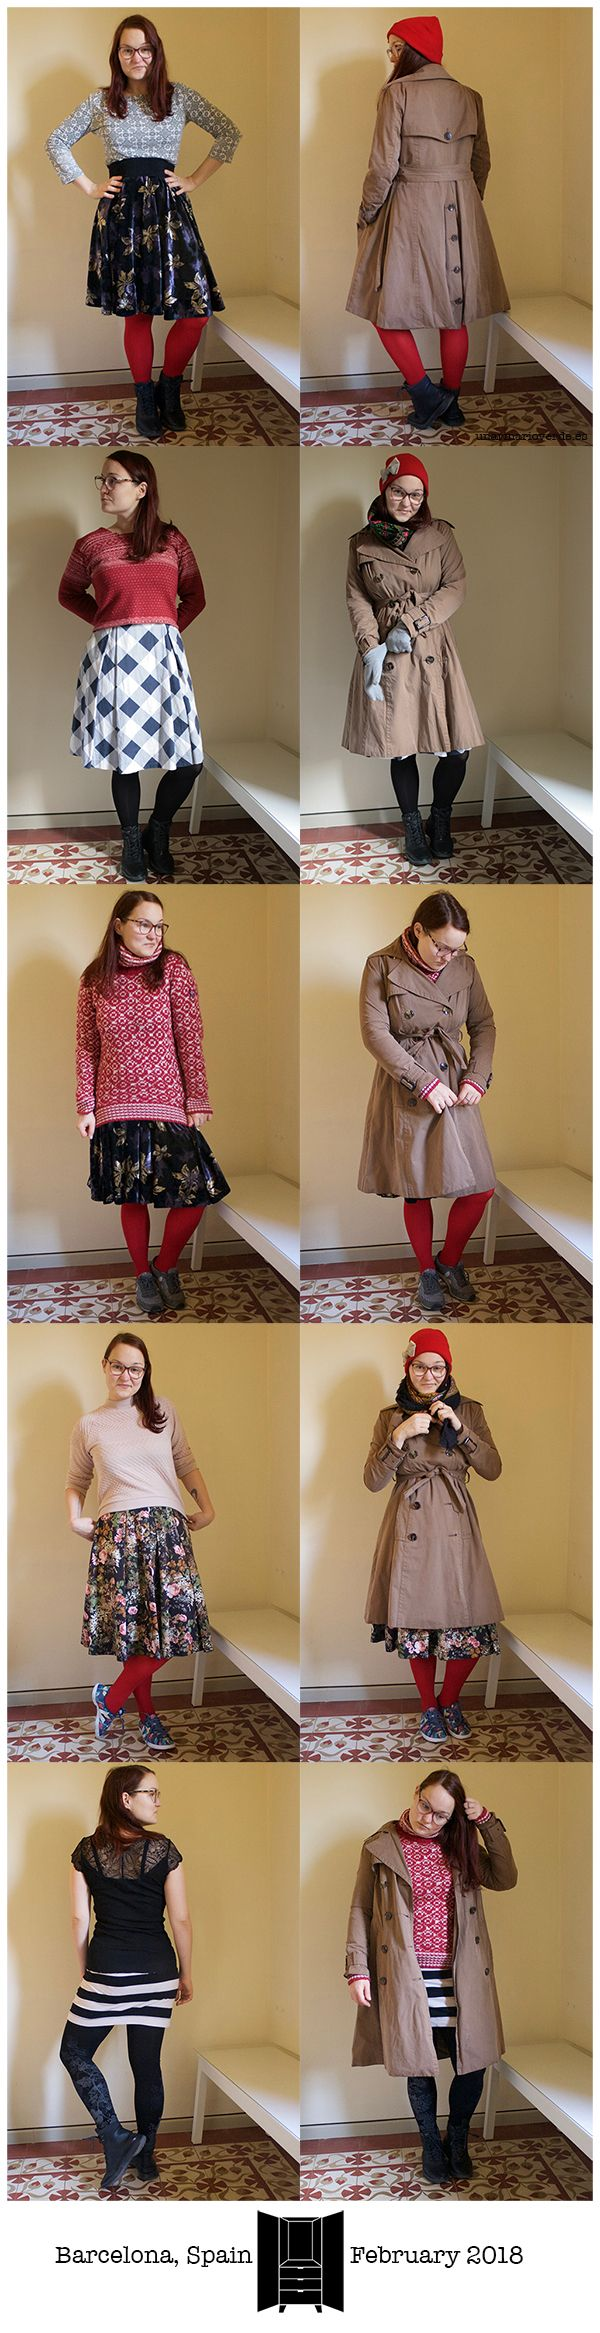 unarmarioverde.es - Winter 2018 capsule wardrobe outfits - February 2018 - Barcelona, Spain